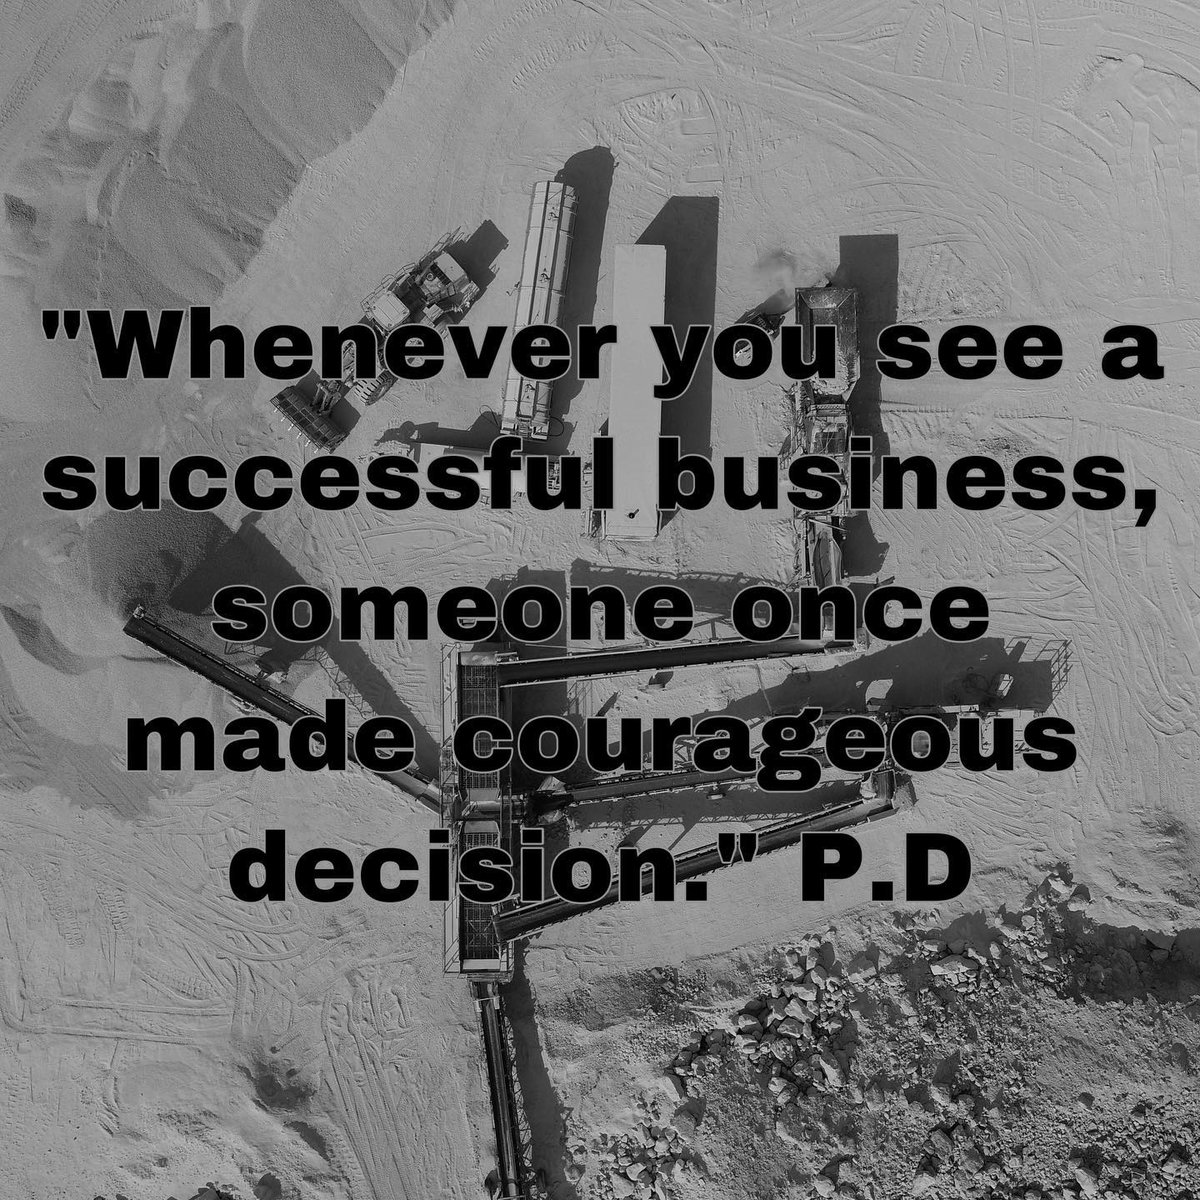 #success #successful #hardwork #workhard #monday #MondayMood #MondayMotivation #MondayMorning #TexasStrong #work #Mining #miningtechnology #miningequipment